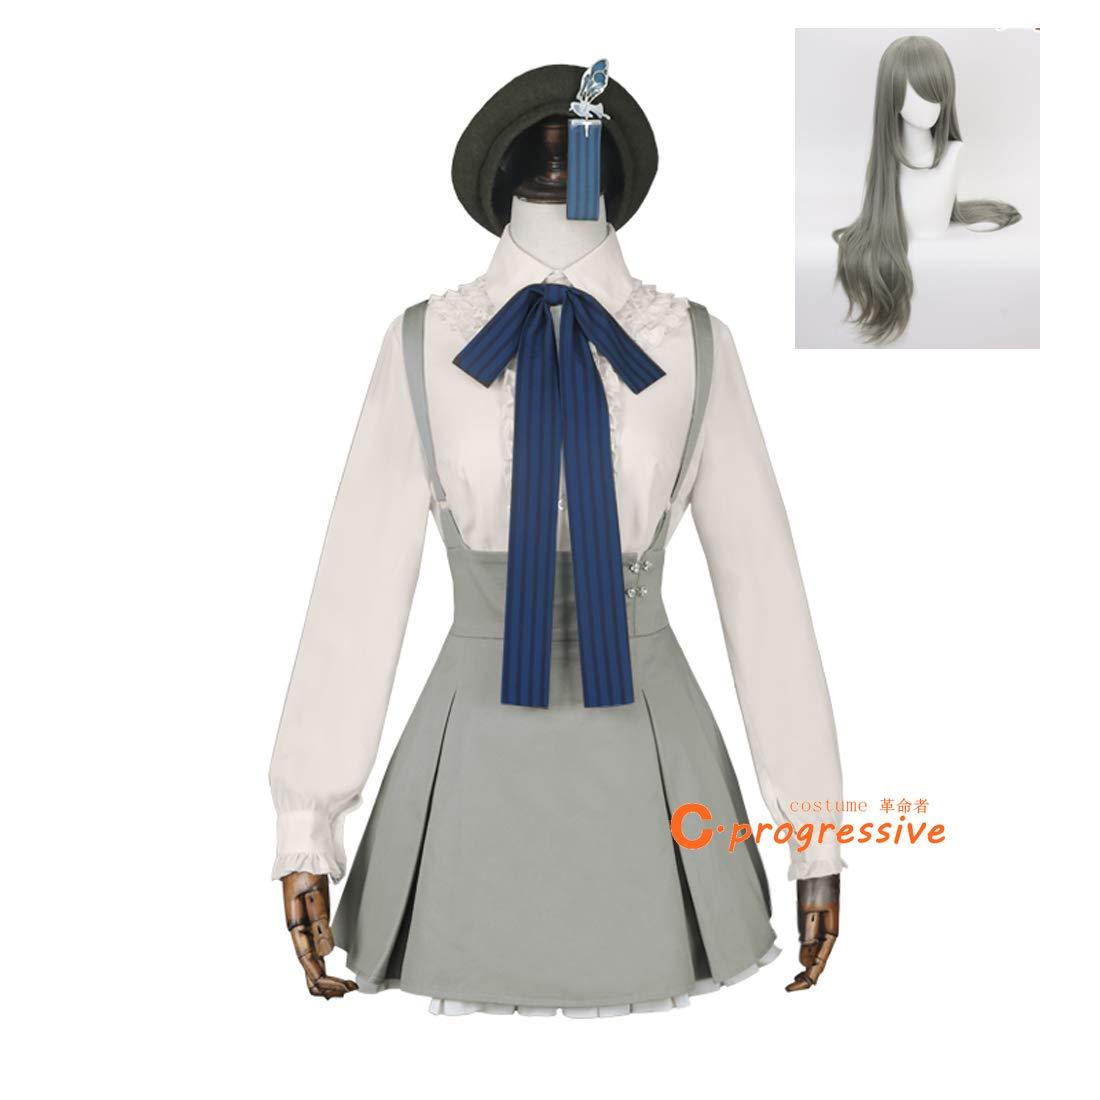 「C.progressive」 シのアリス ピノキオ コスプレ 衣装 グレー 依存 ウィッグ追加可能 (服装+ウィッグ, XL) B07MTLTBF1 服装+ウィッグ L L|服装+ウィッグ